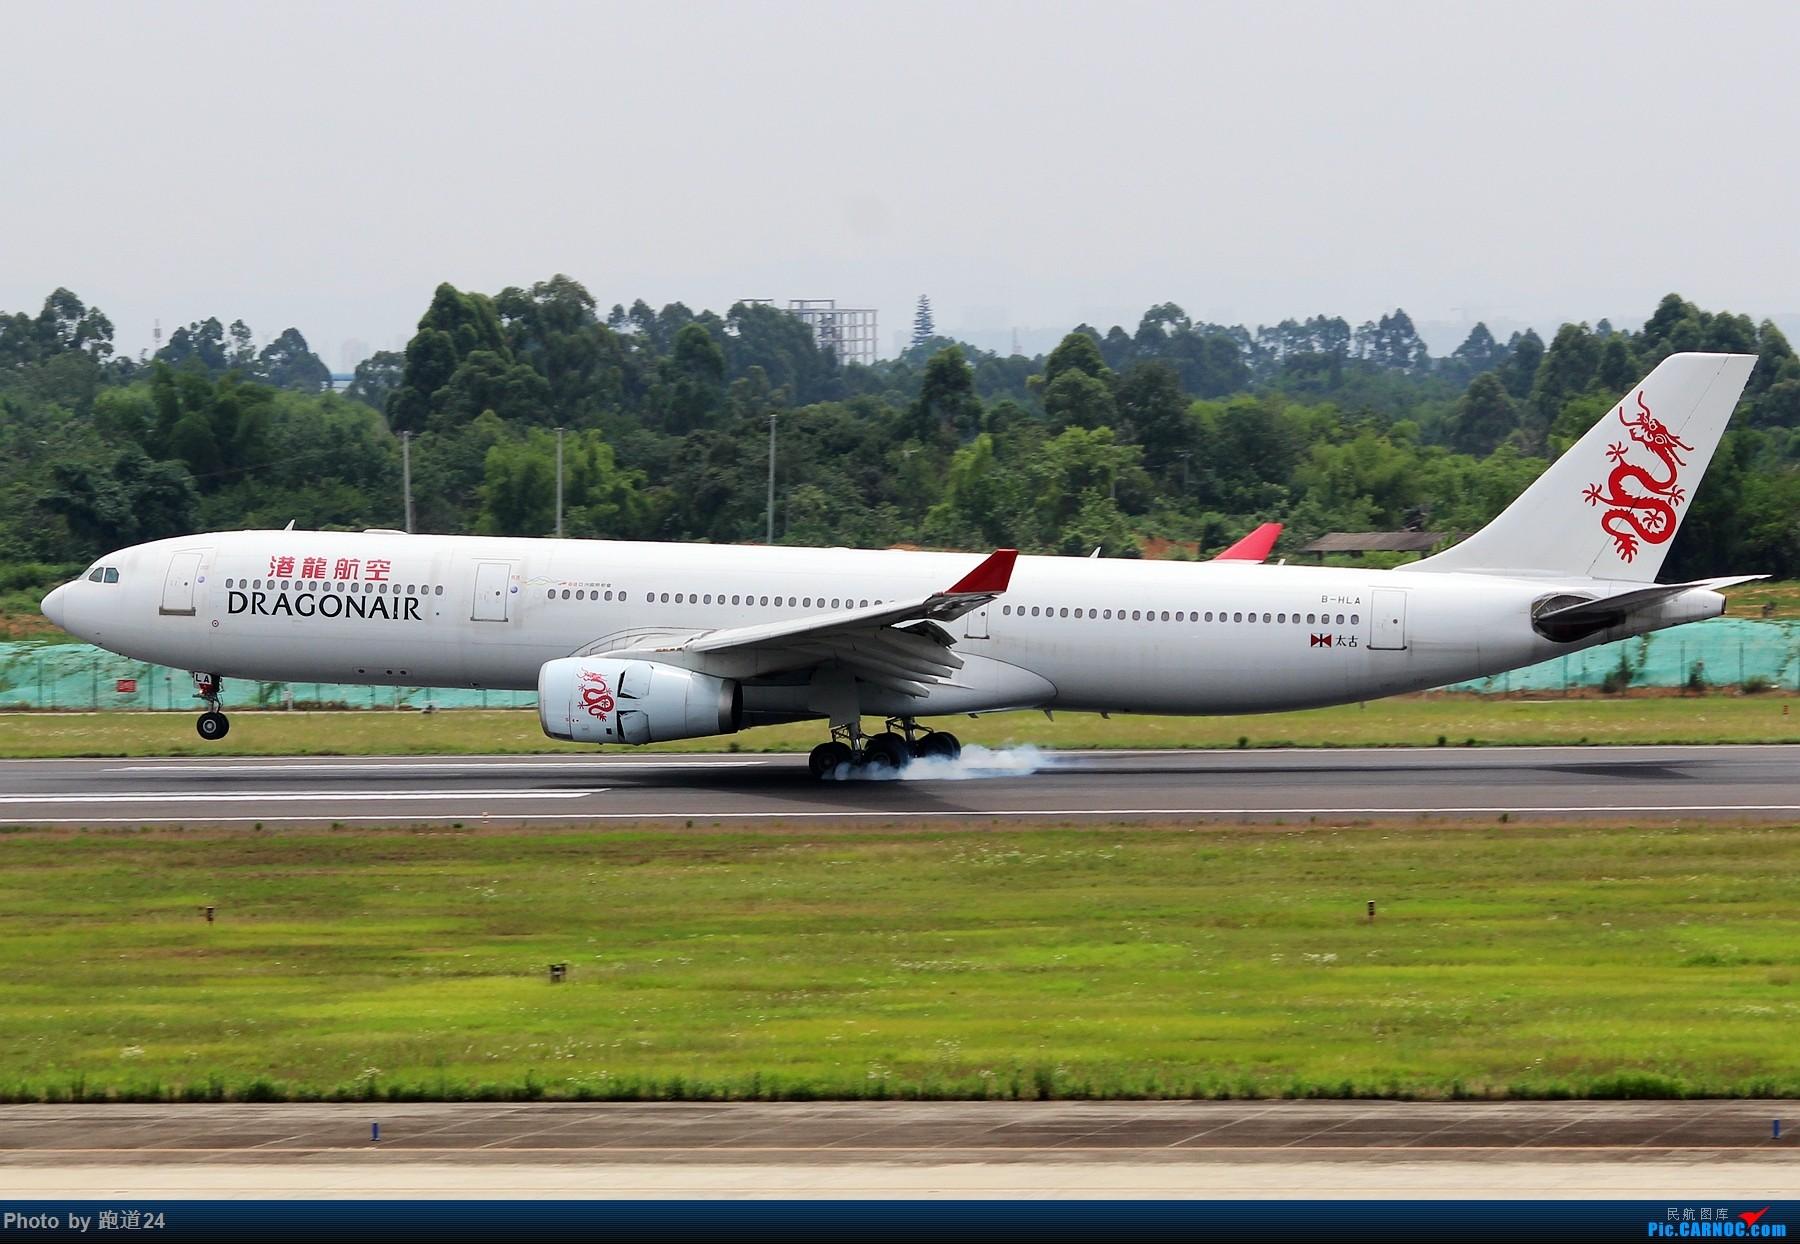 Re:[原创]【多图党】6月18日成都拍机【埃塞俄比亚航空B777-200LR】 AIRBUS A330-300 B-HLA 中国成都双流国际机场